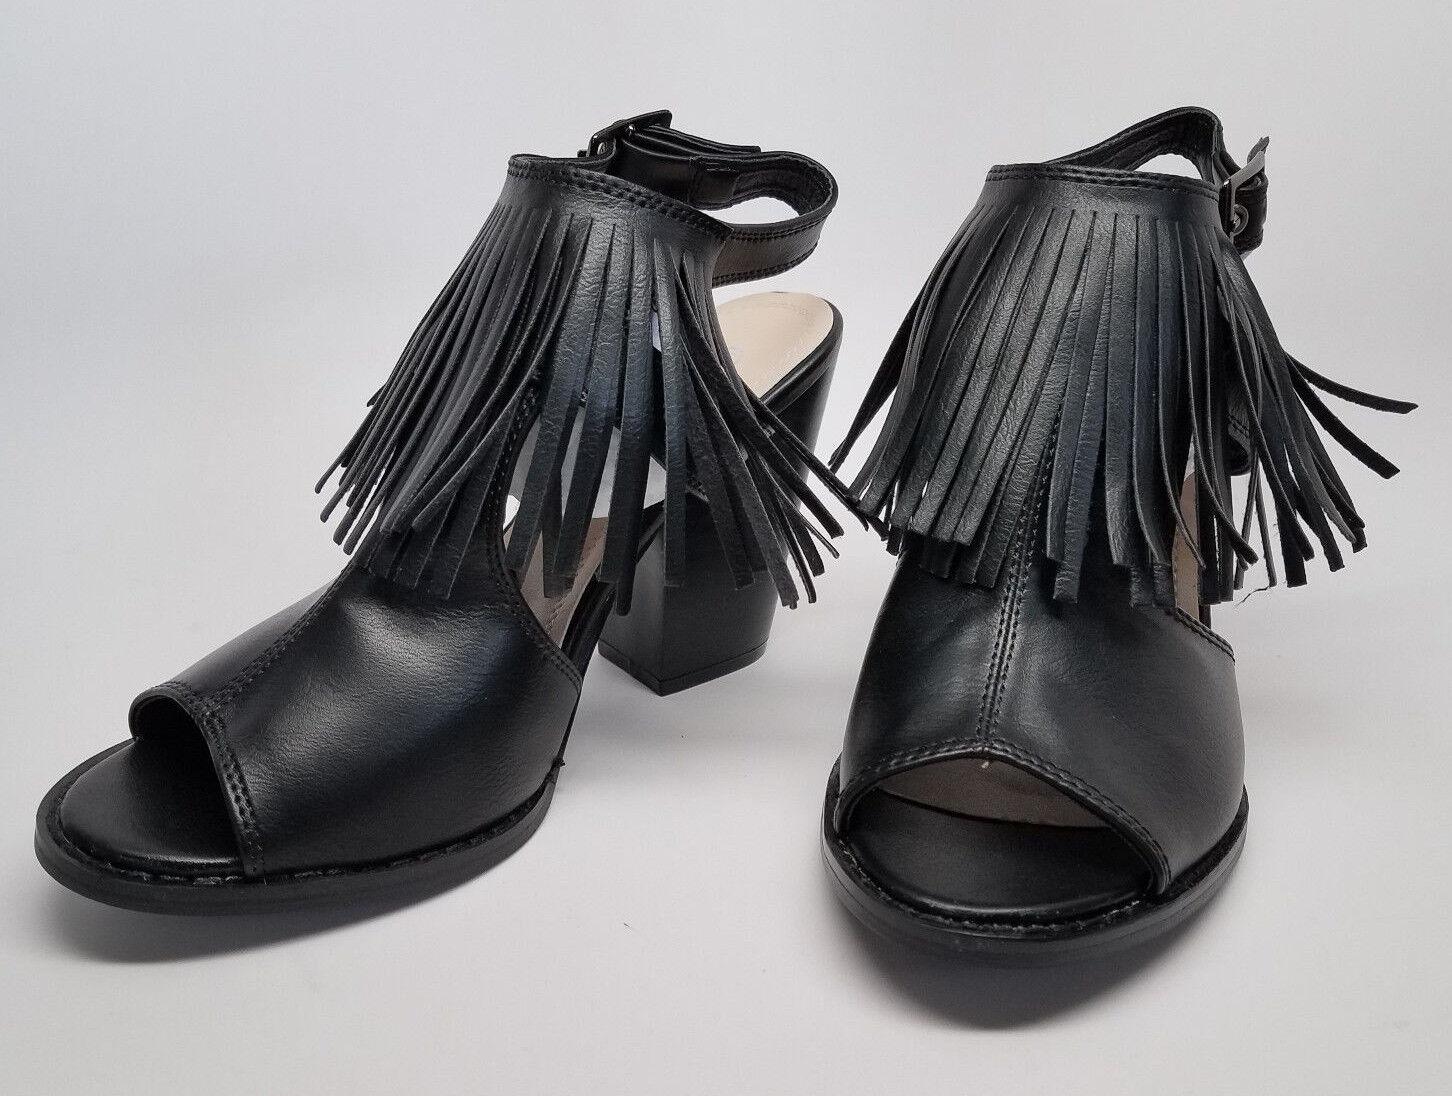 CLOSE leather OUT! BLACK SANDALS Size 8.5 heel stack faux leather CLOSE peep toe fringe tassle a93e19